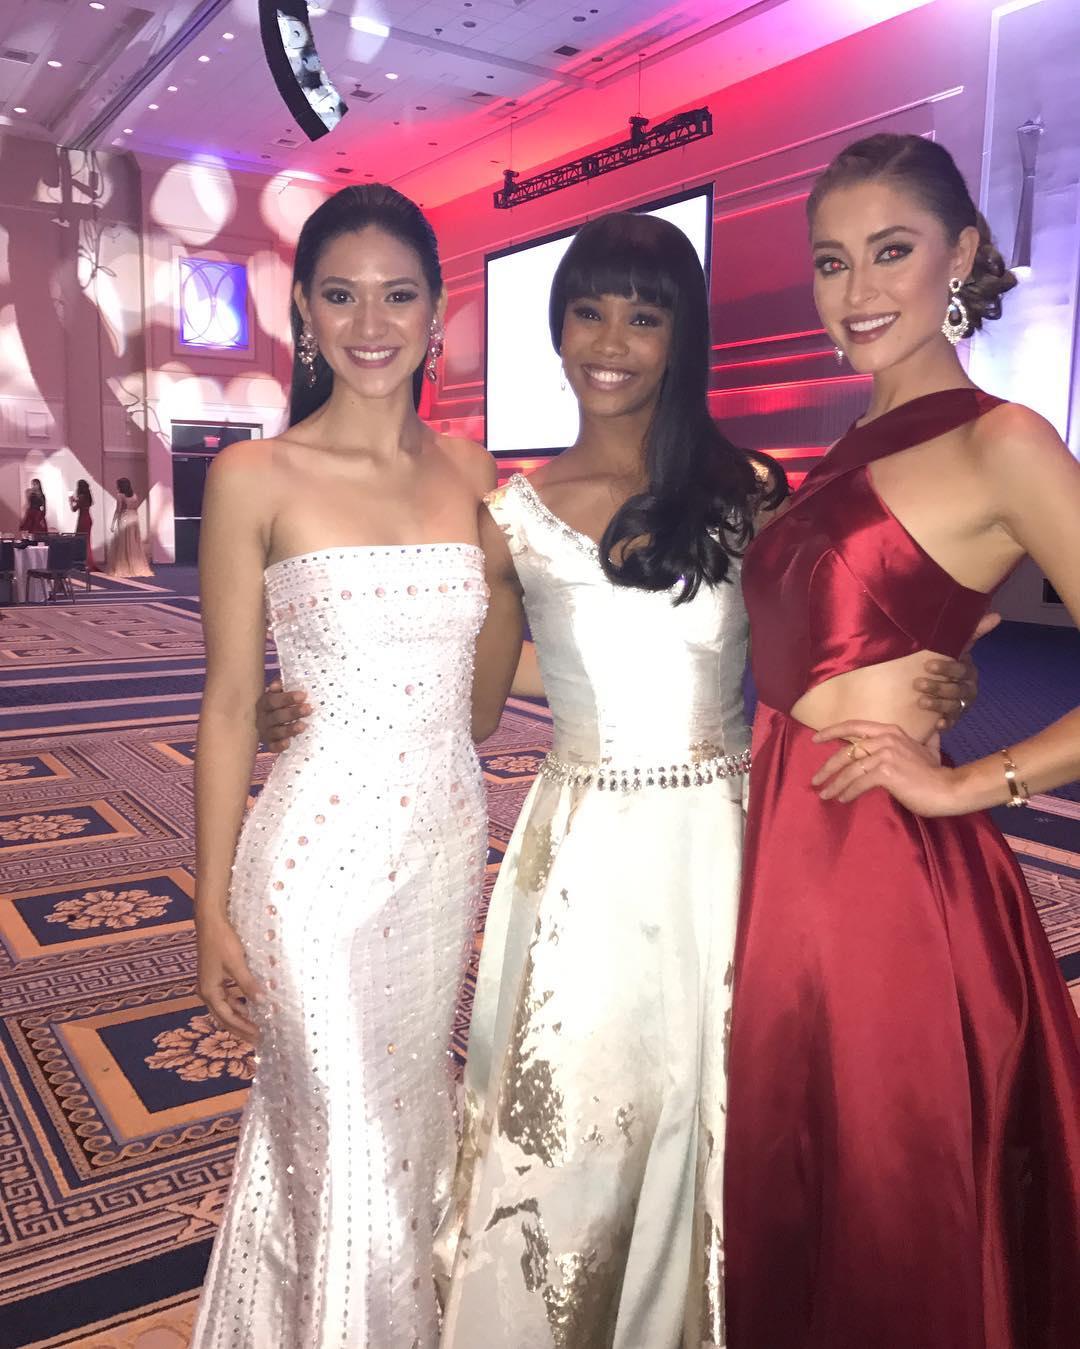 ana girault, miss mundo mexico 2016. - Página 17 Vqasuzzq